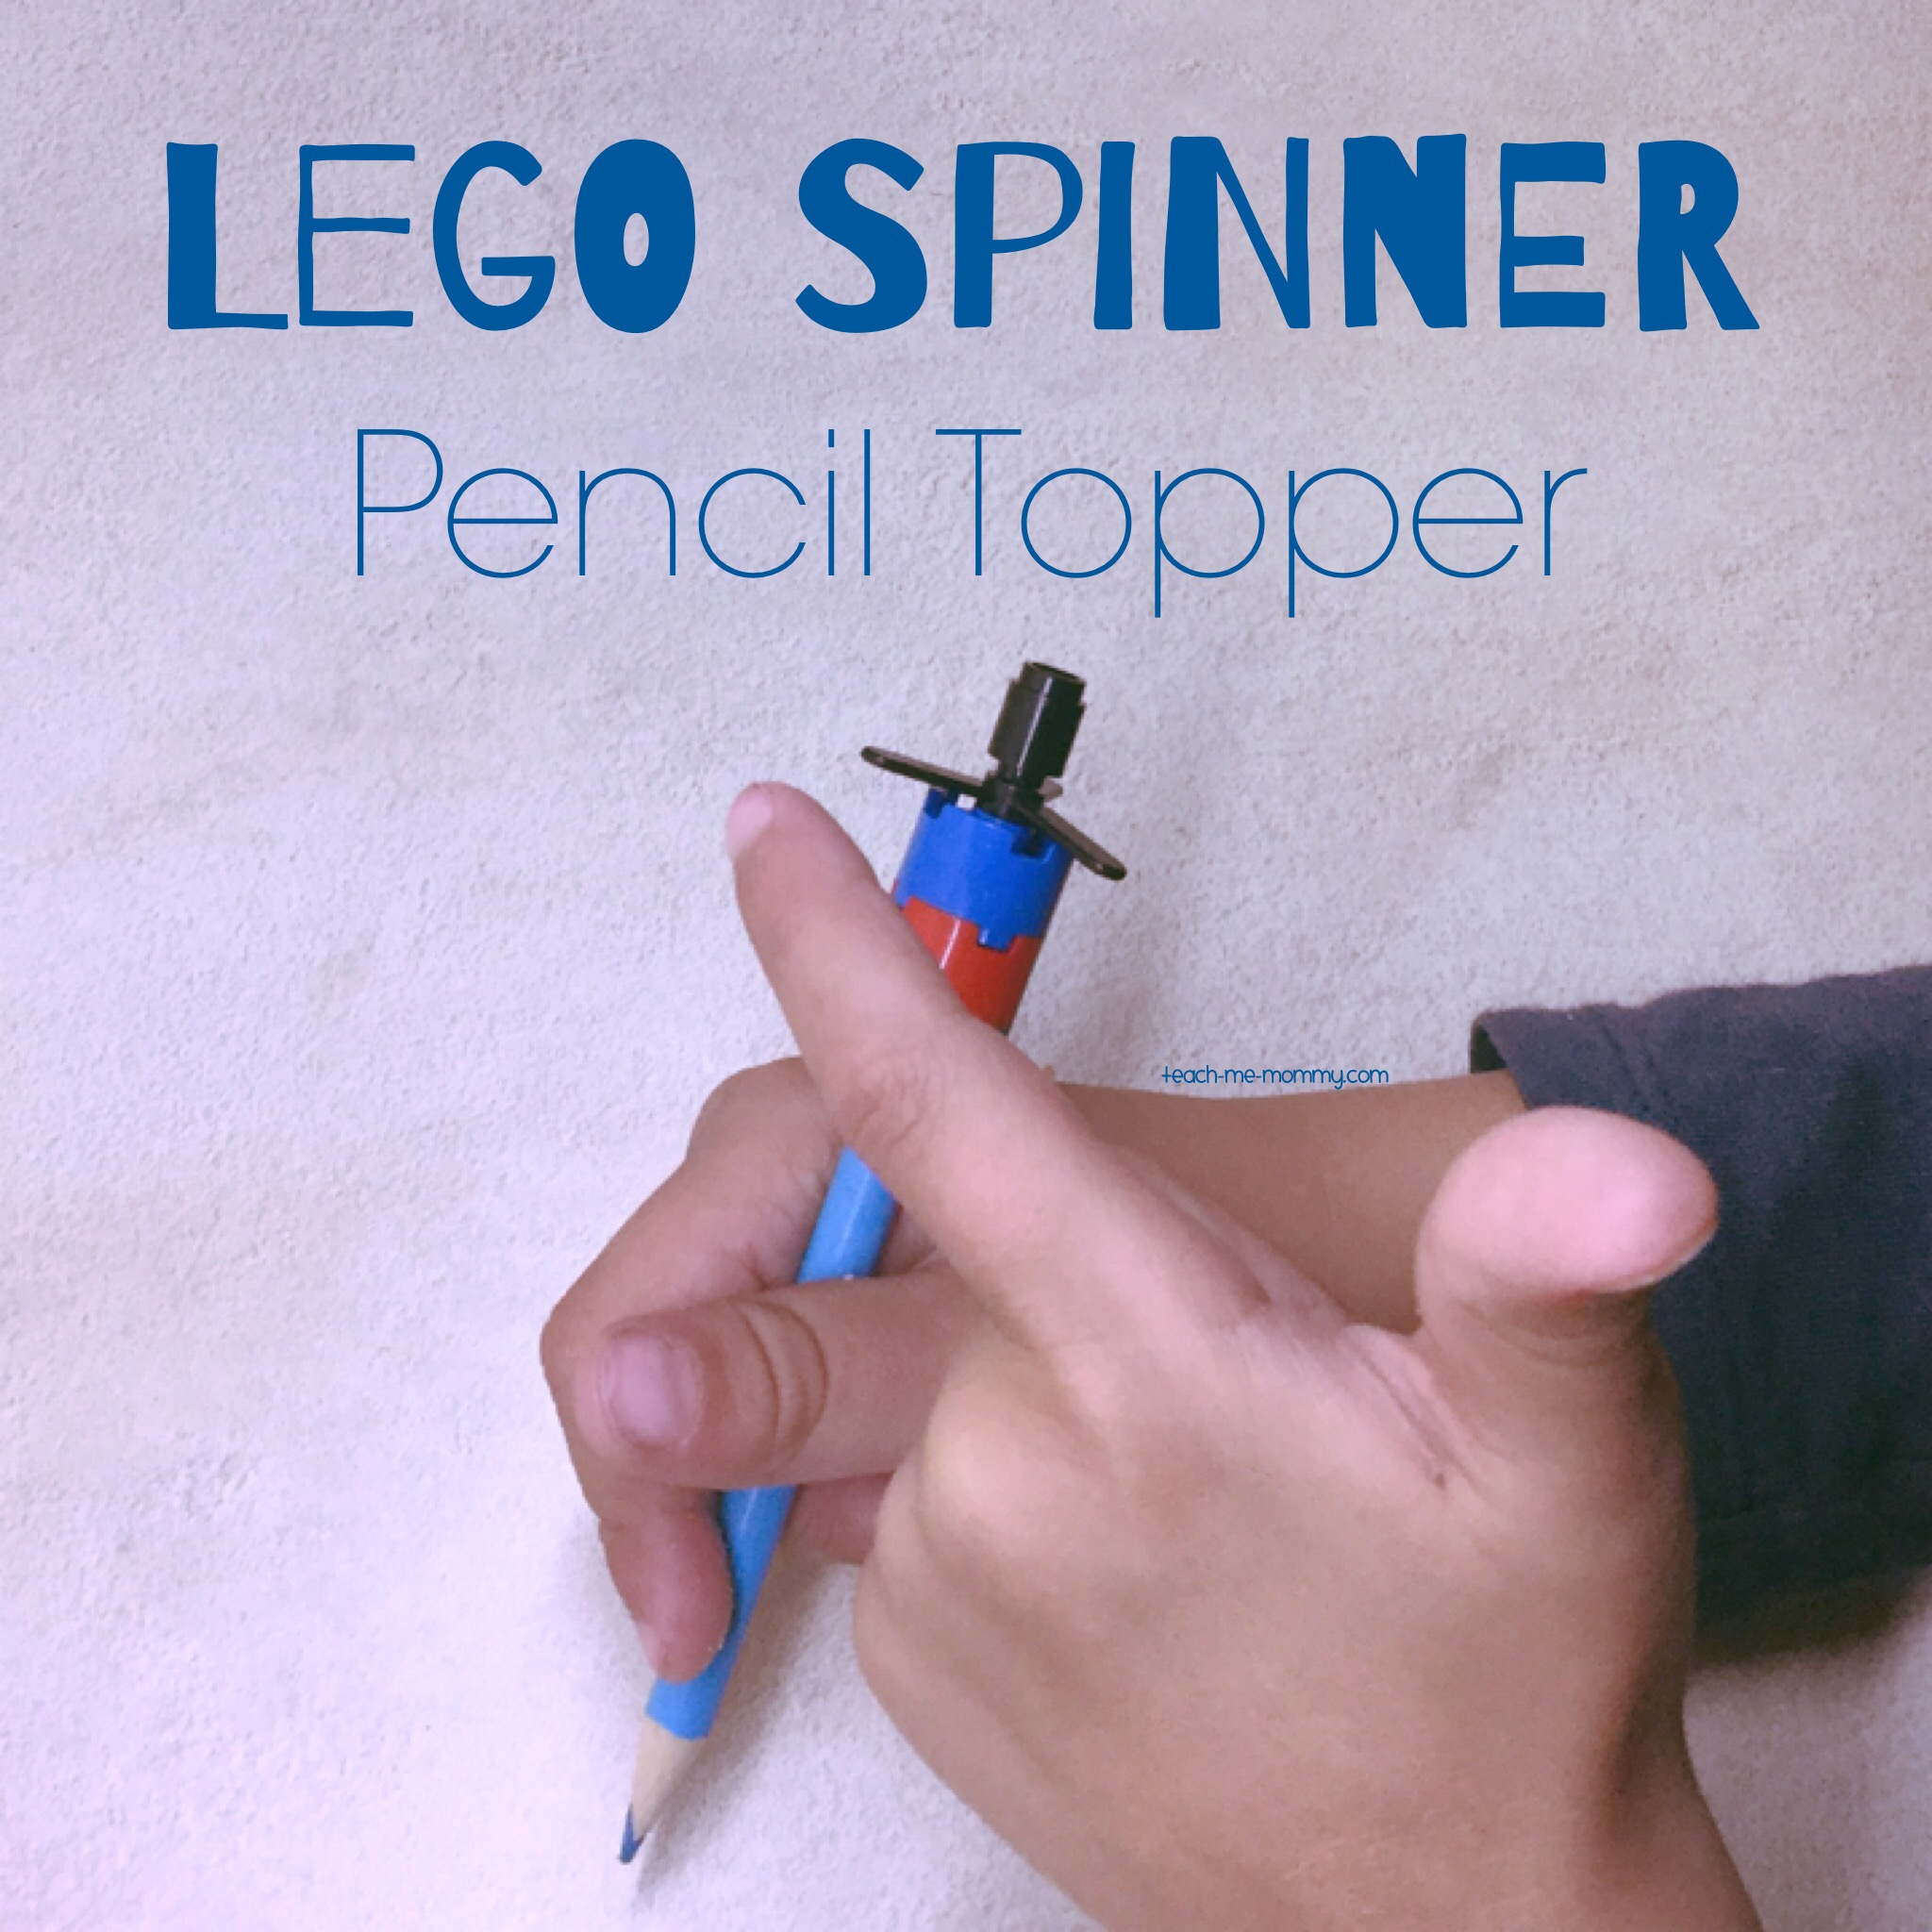 lego spinner pencil topper teach me mommy